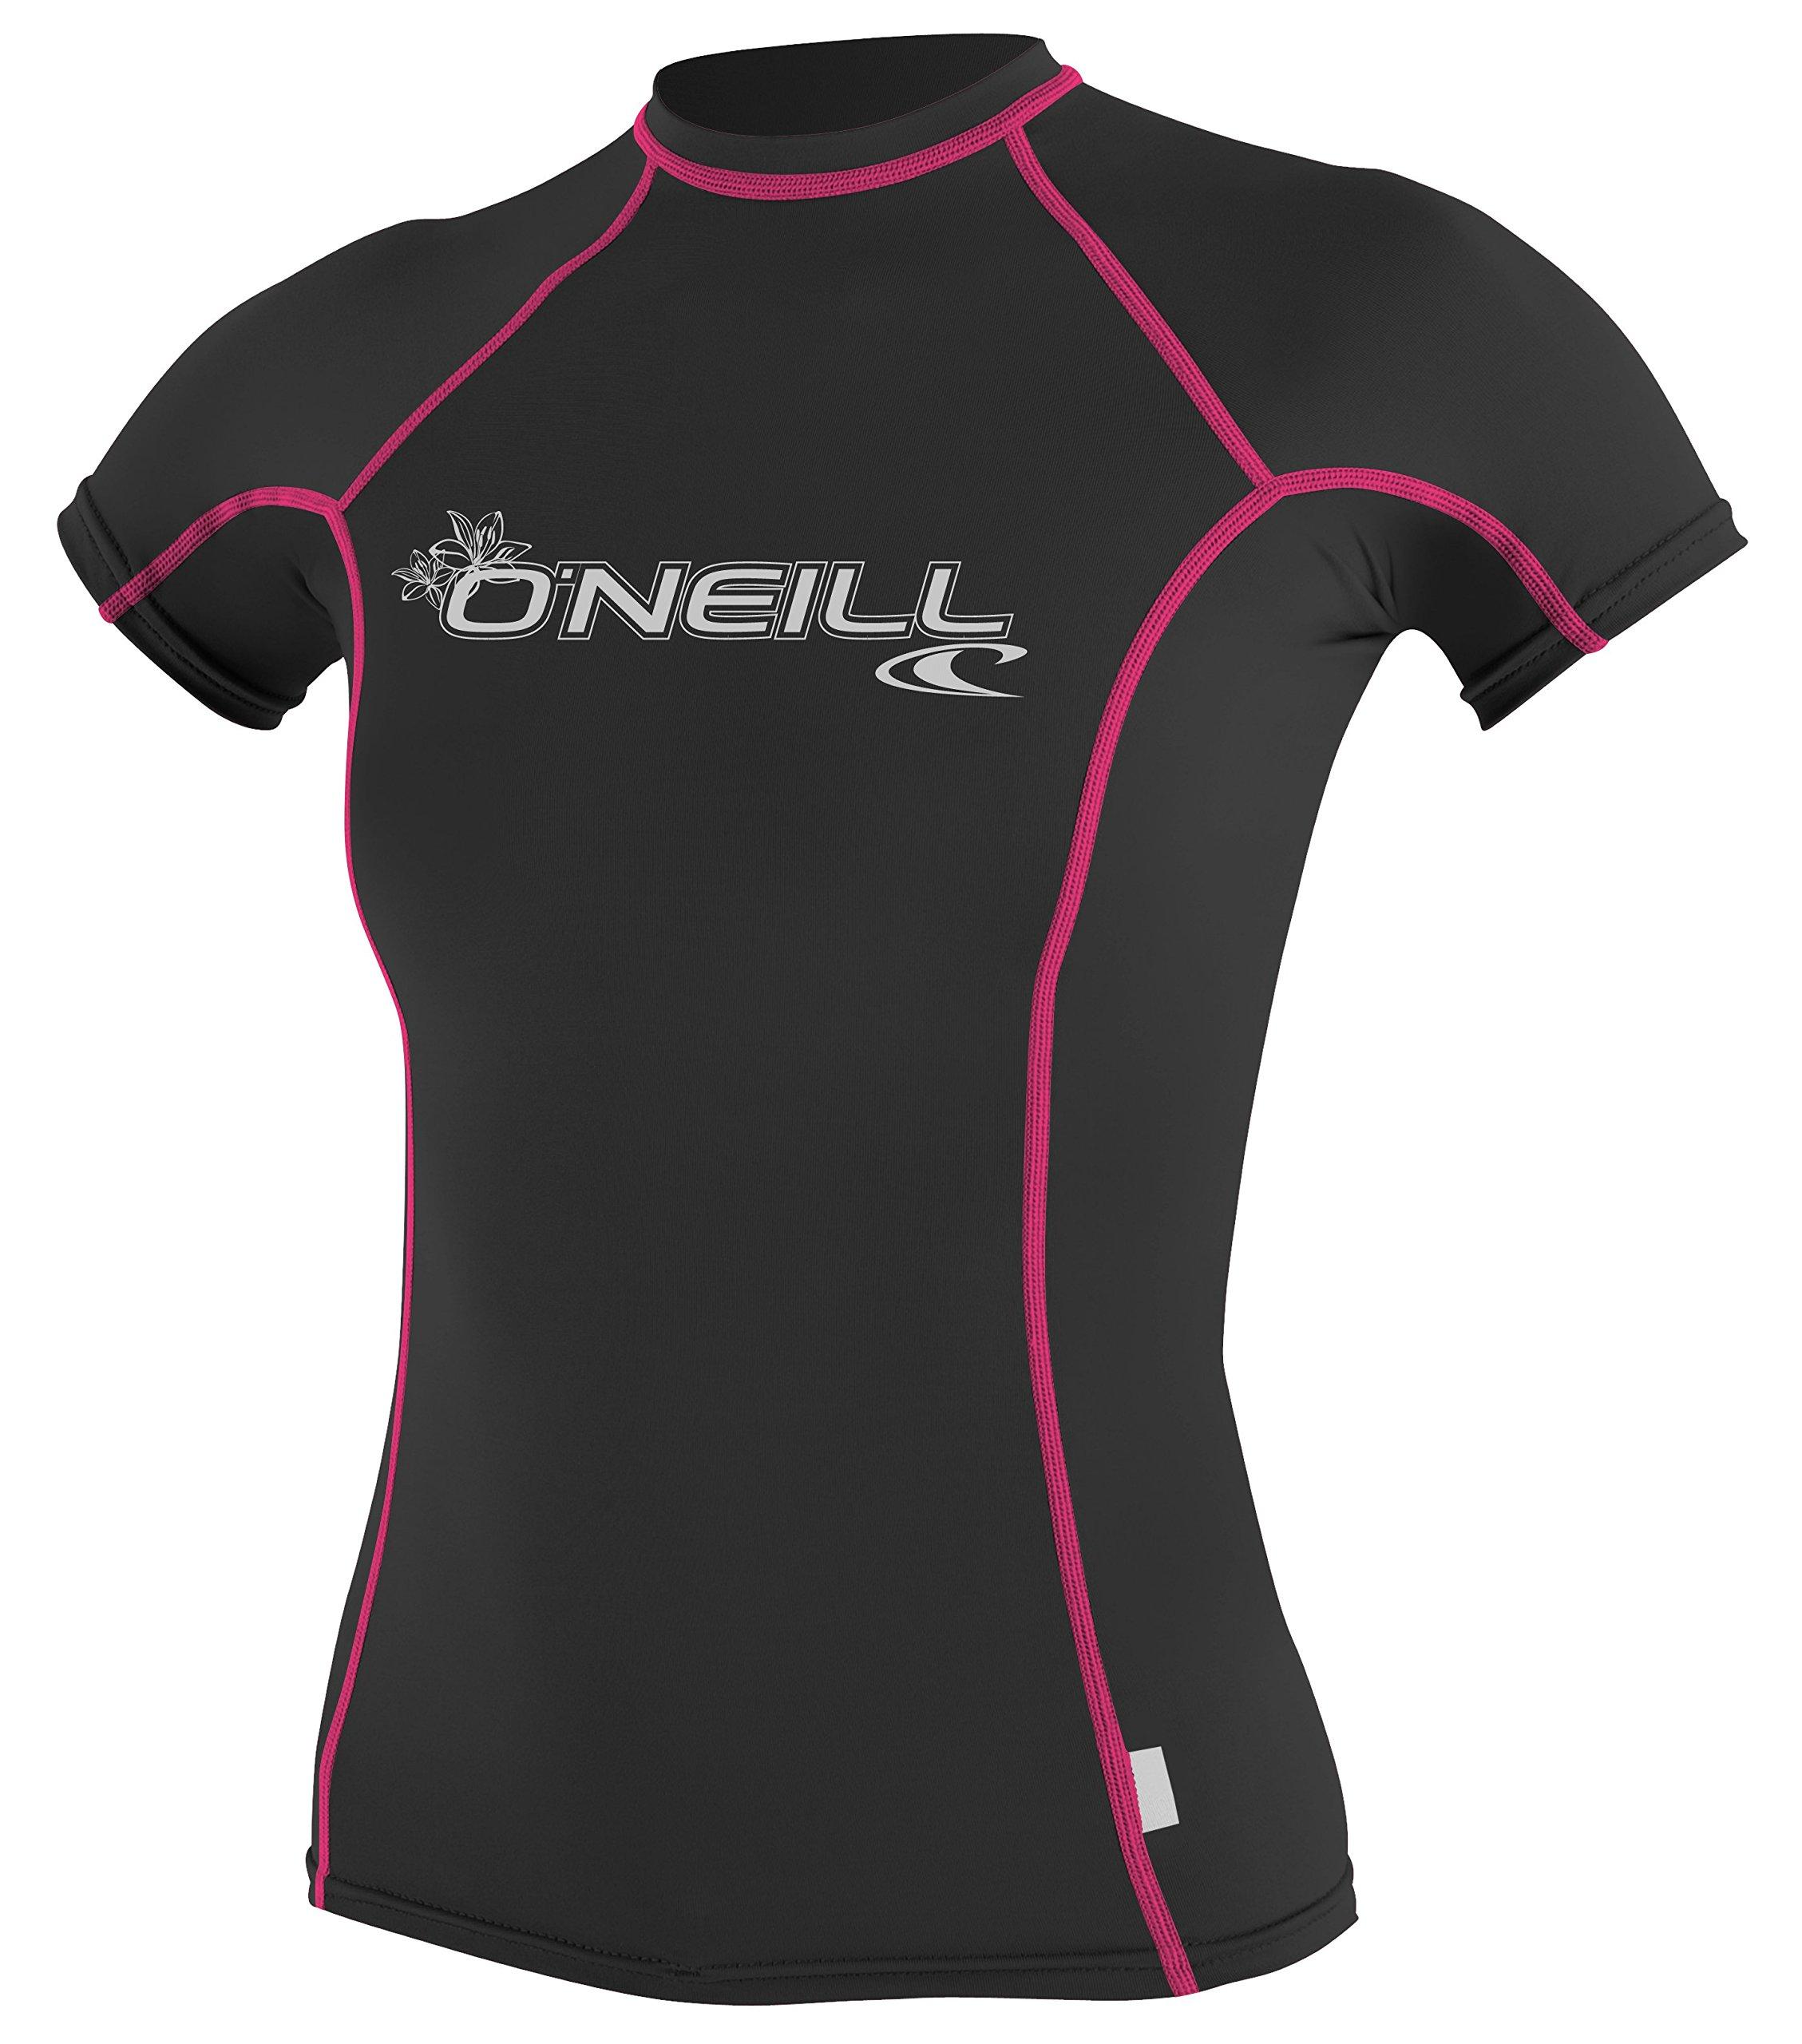 O'NEILL Wetsuits UV Women's Skins Short Sleeve Crew Sun Shirt Rash Guard, Large, Black Pink Stripe by O'NEILL